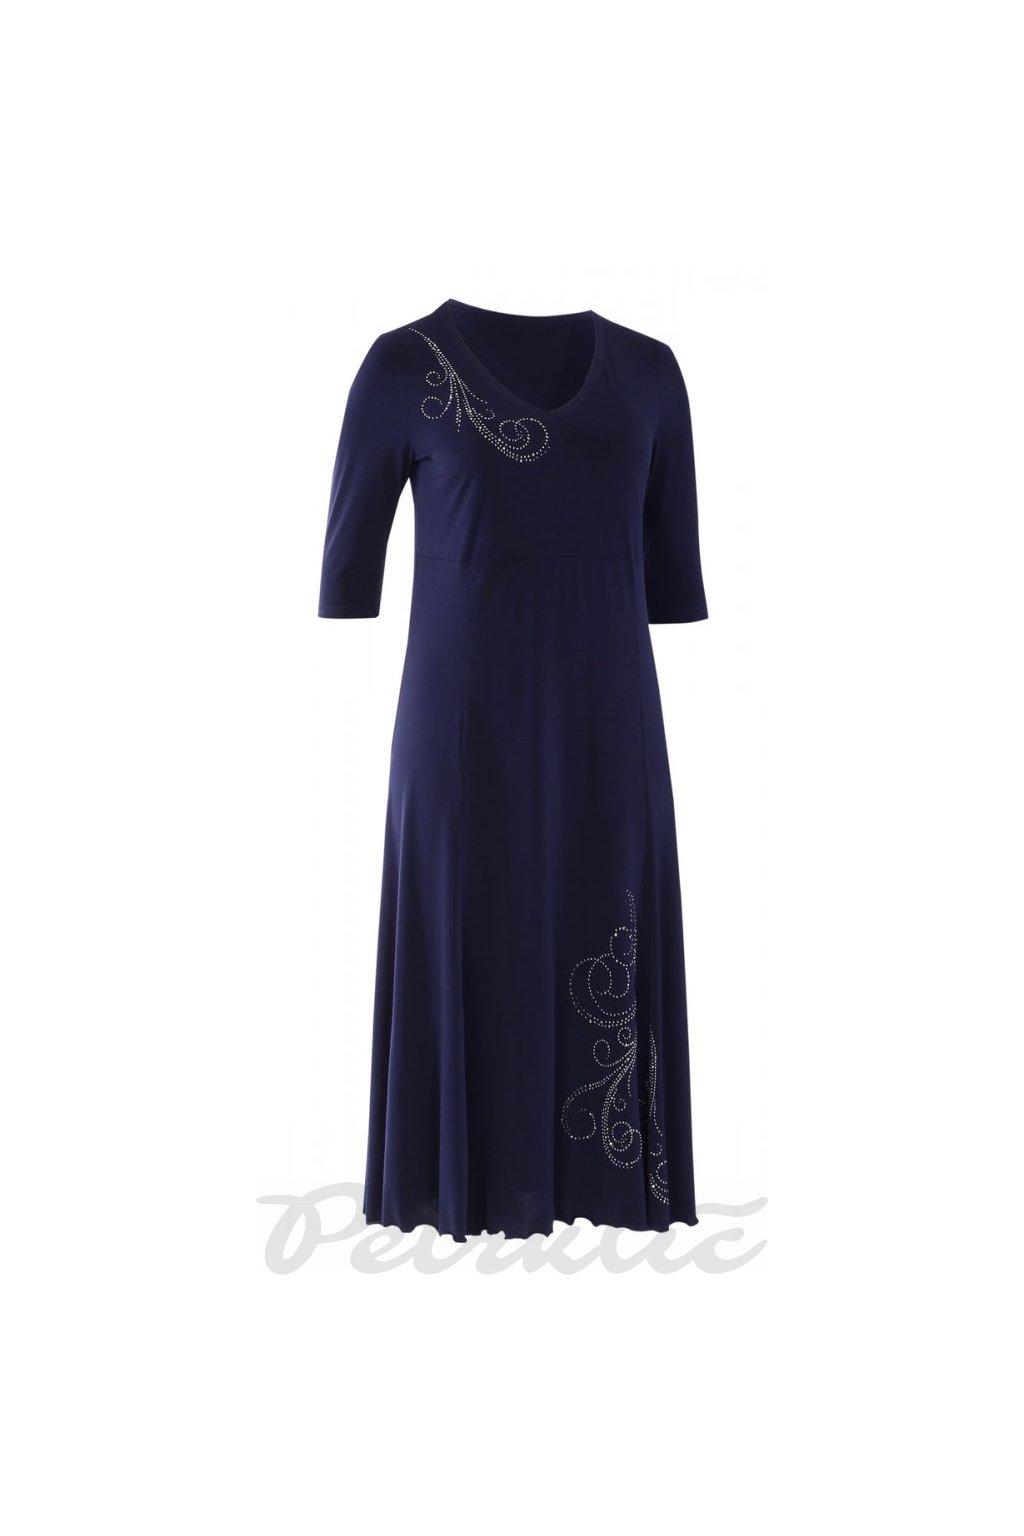 AGNES šaty 120 - 125 cm